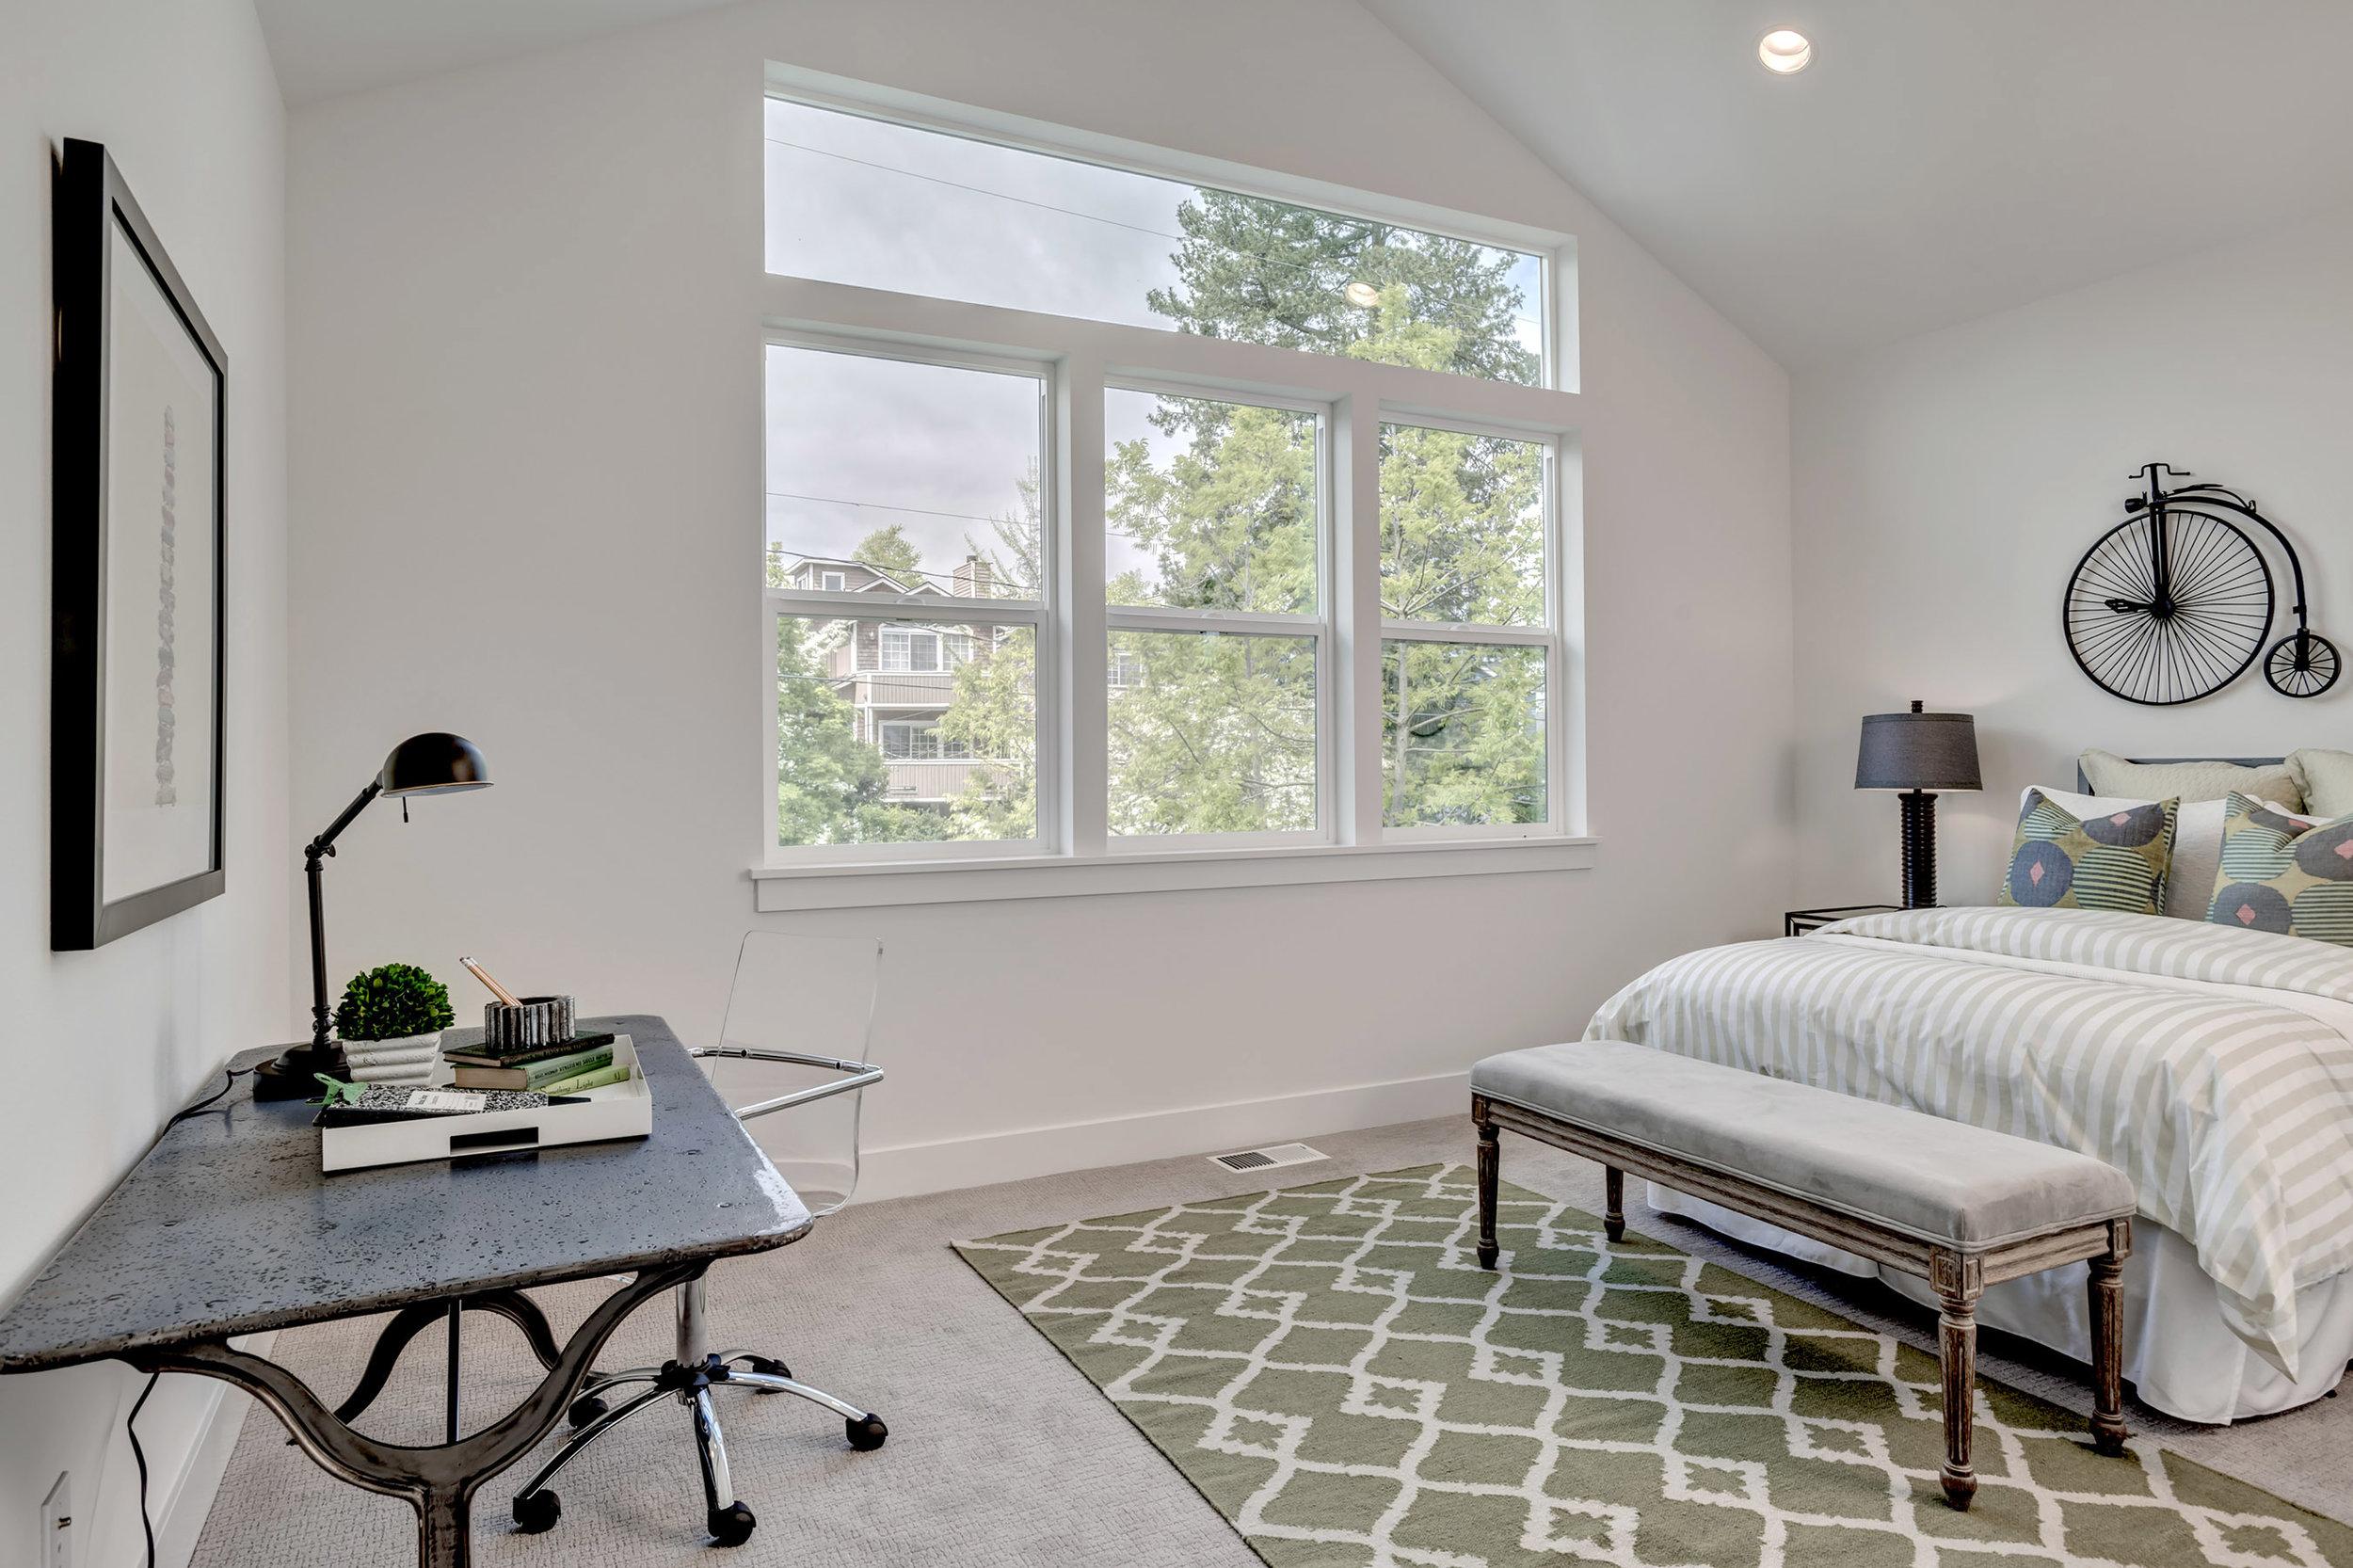 Bedroom03.jpg